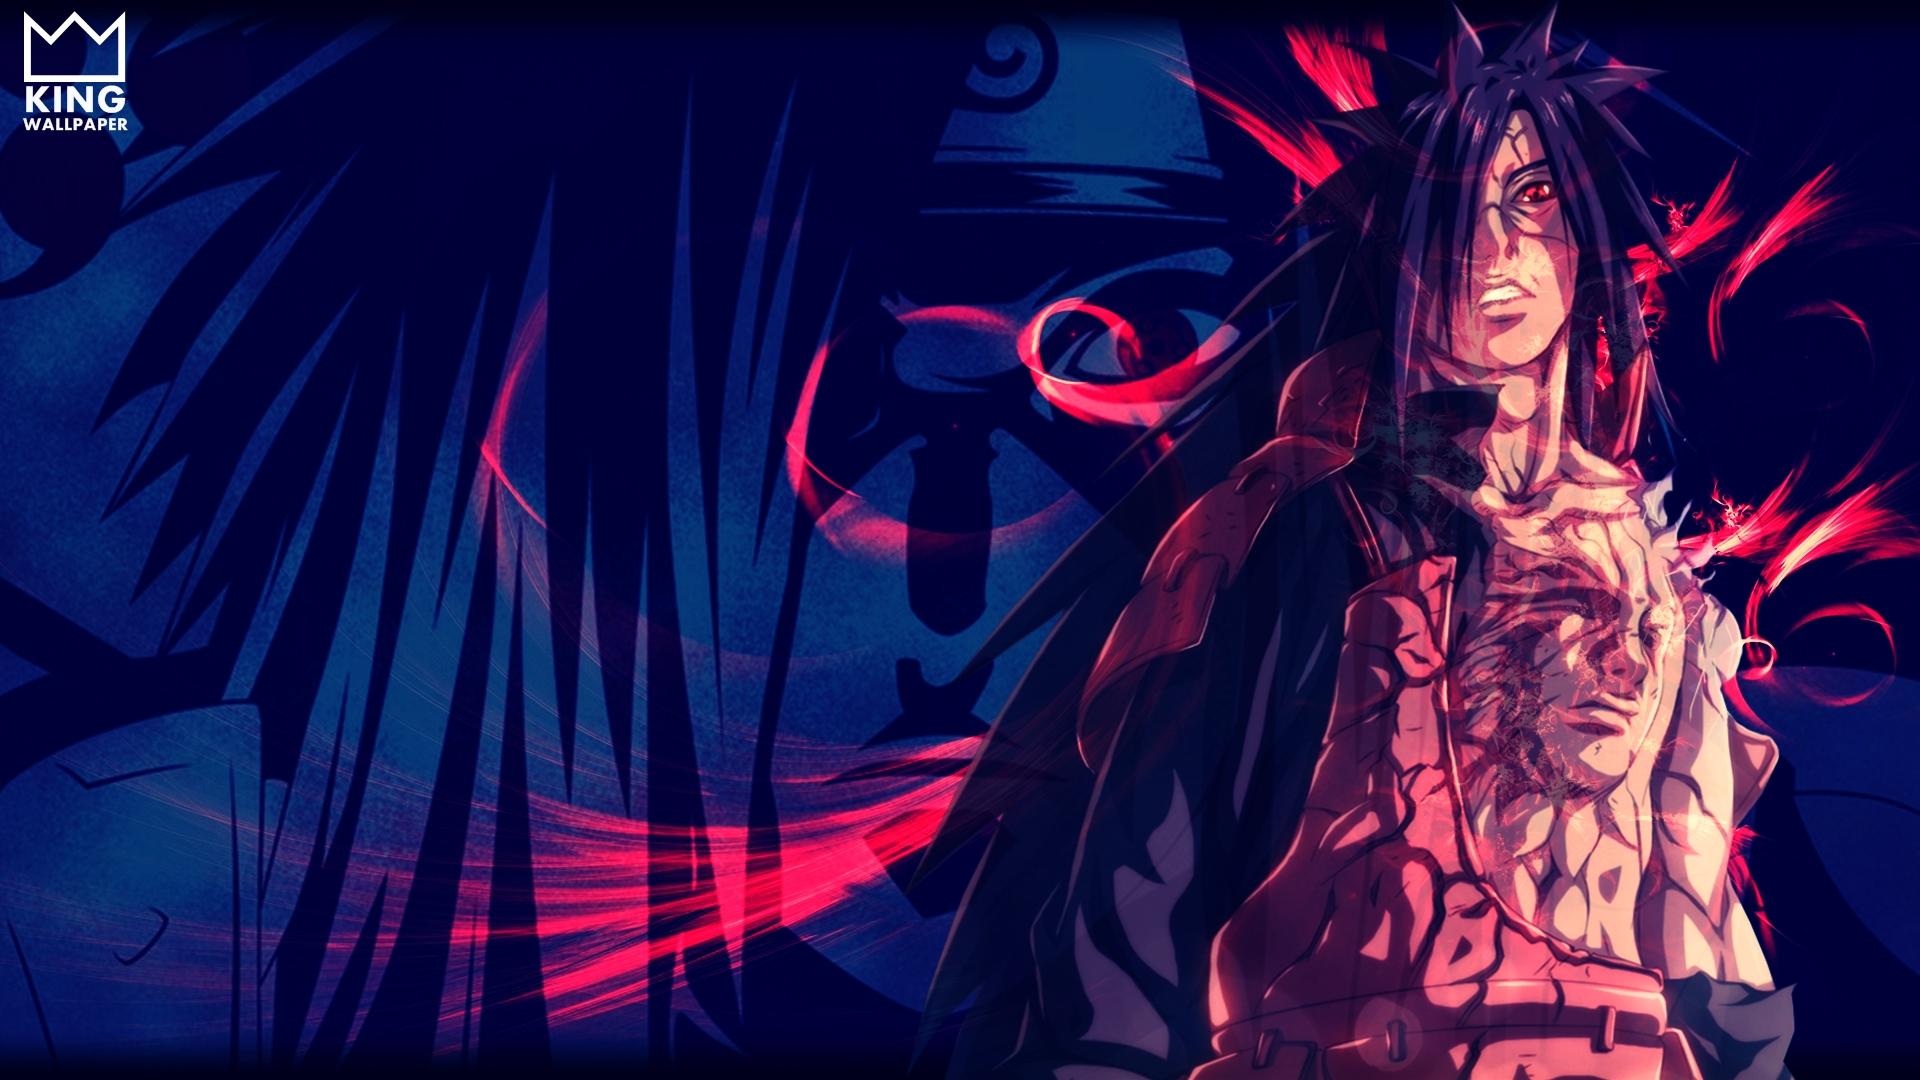 [49+] Naruto Madara Wallpaper On WallpaperSafari